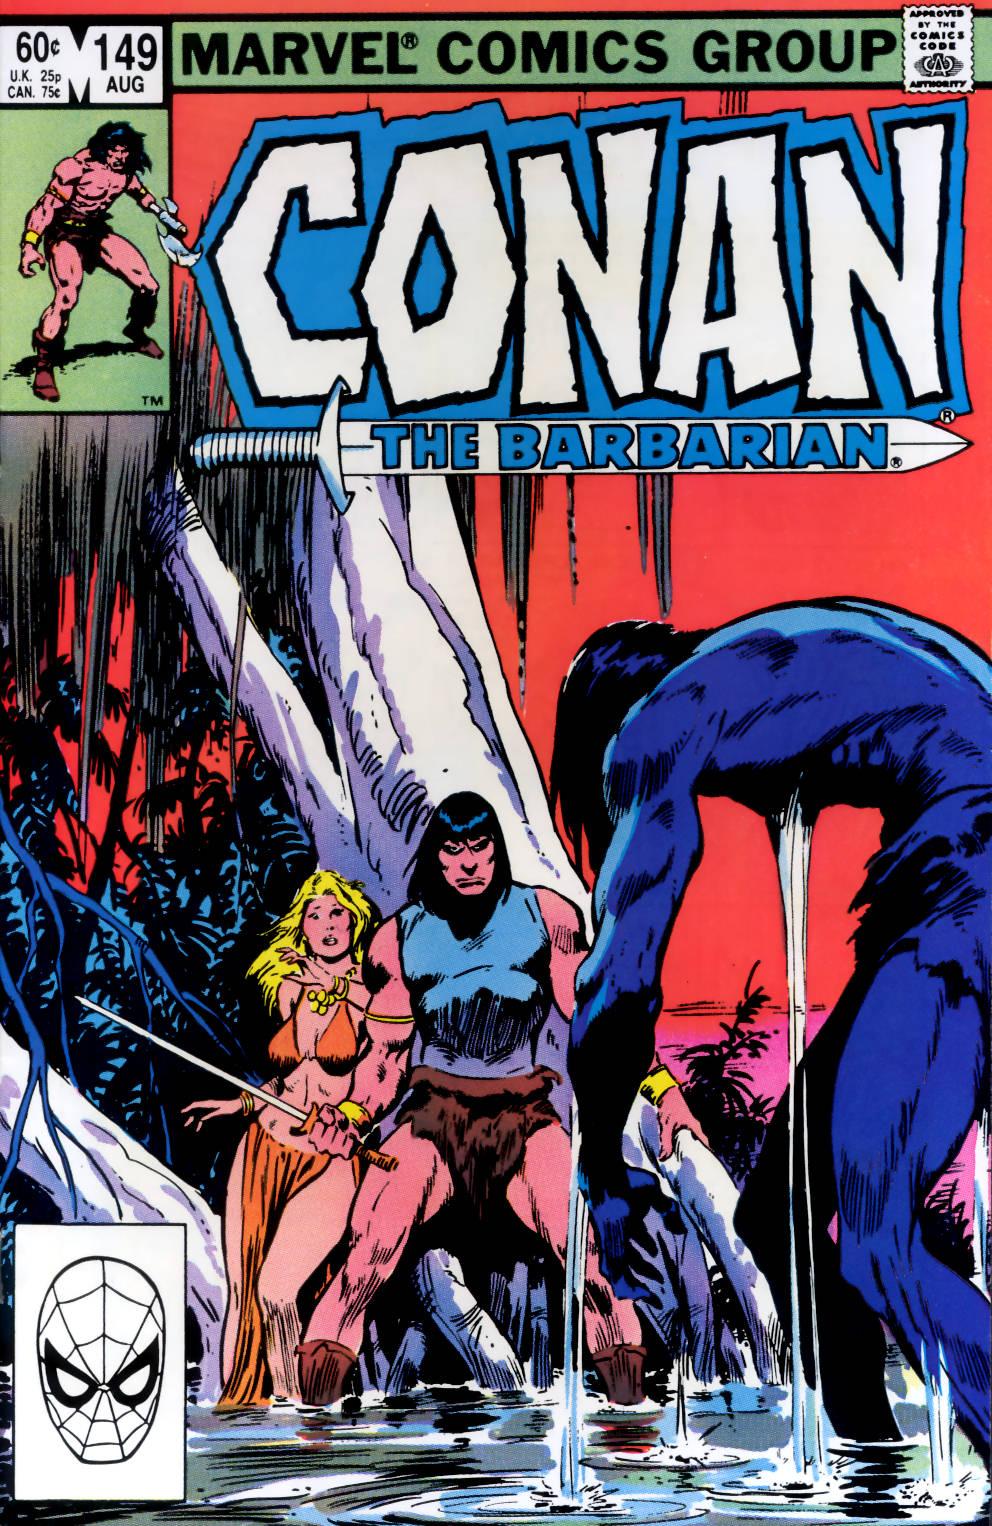 Conan the Barbarian 149